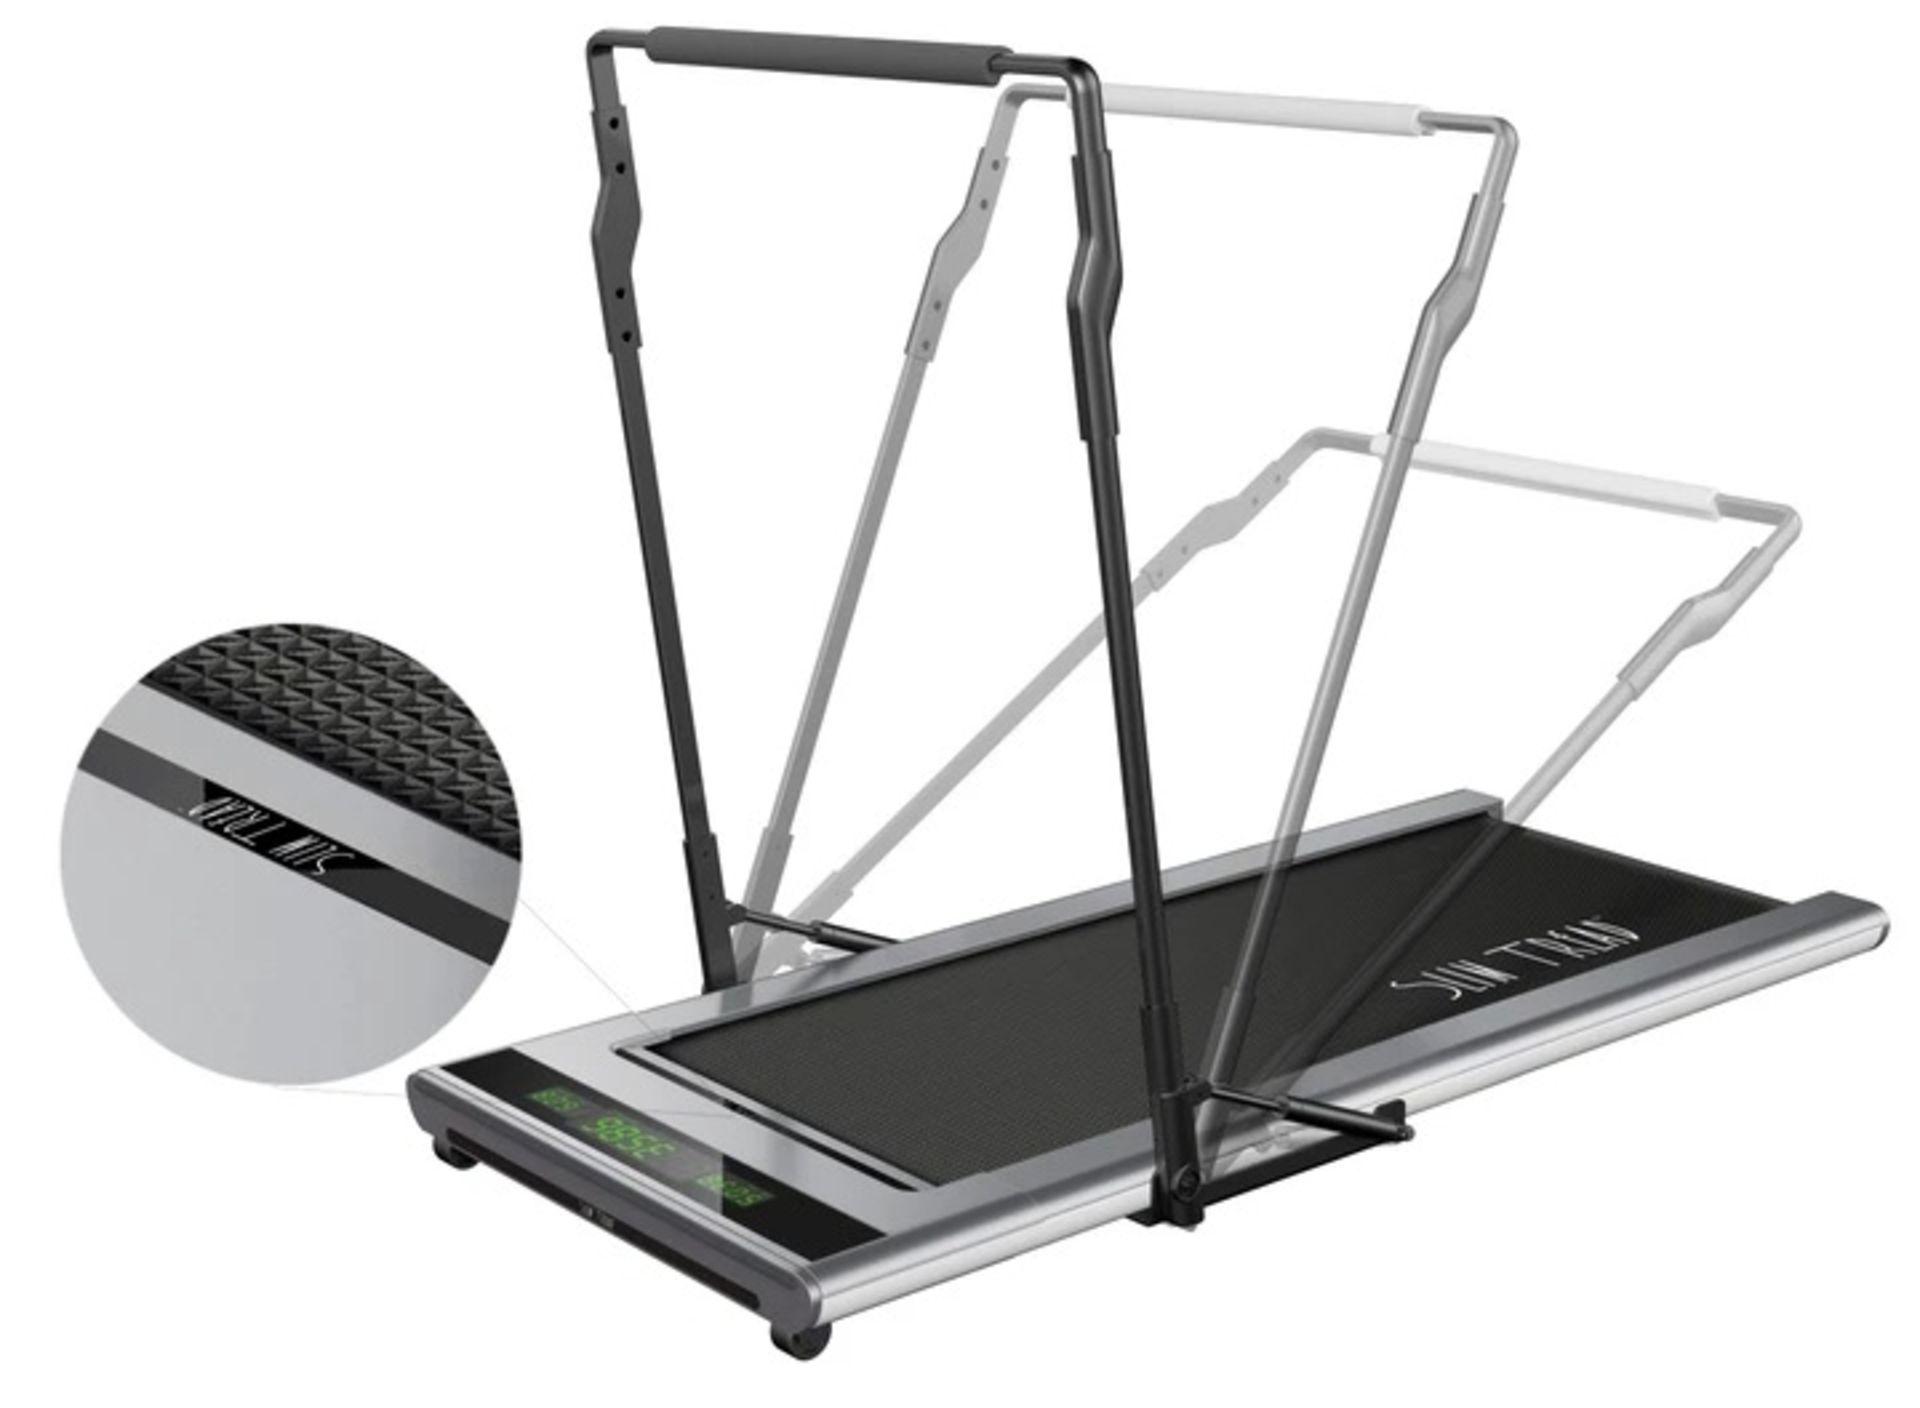 1 x Slim Tread Ultra Thin Smart Treadmill Running / Walking Machine - Lightweight With Folding - Image 17 of 23